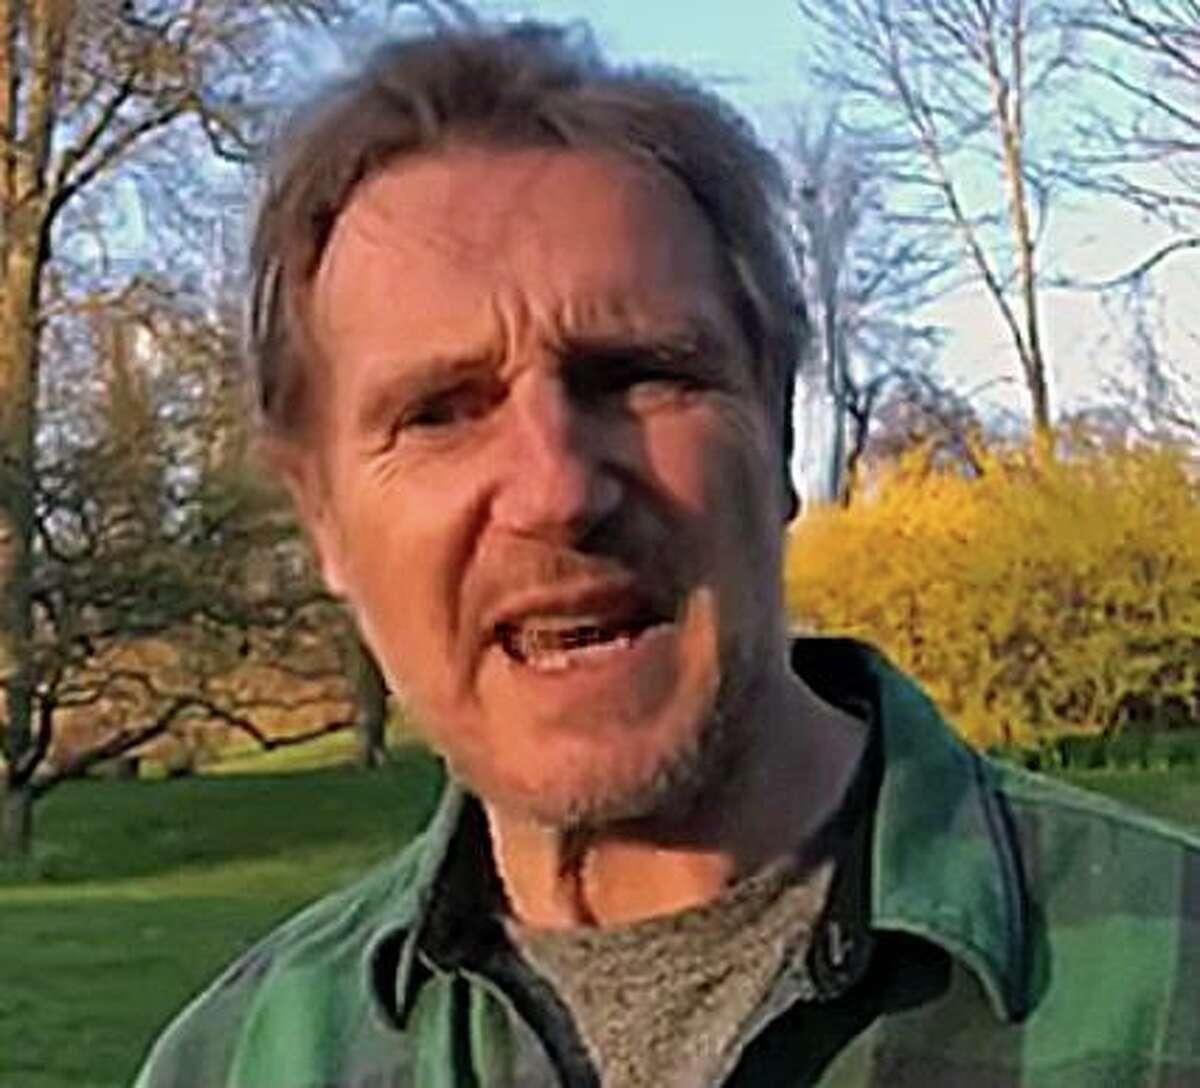 A screenshot of Liam Neeson's appeal for Sharon Hospital.